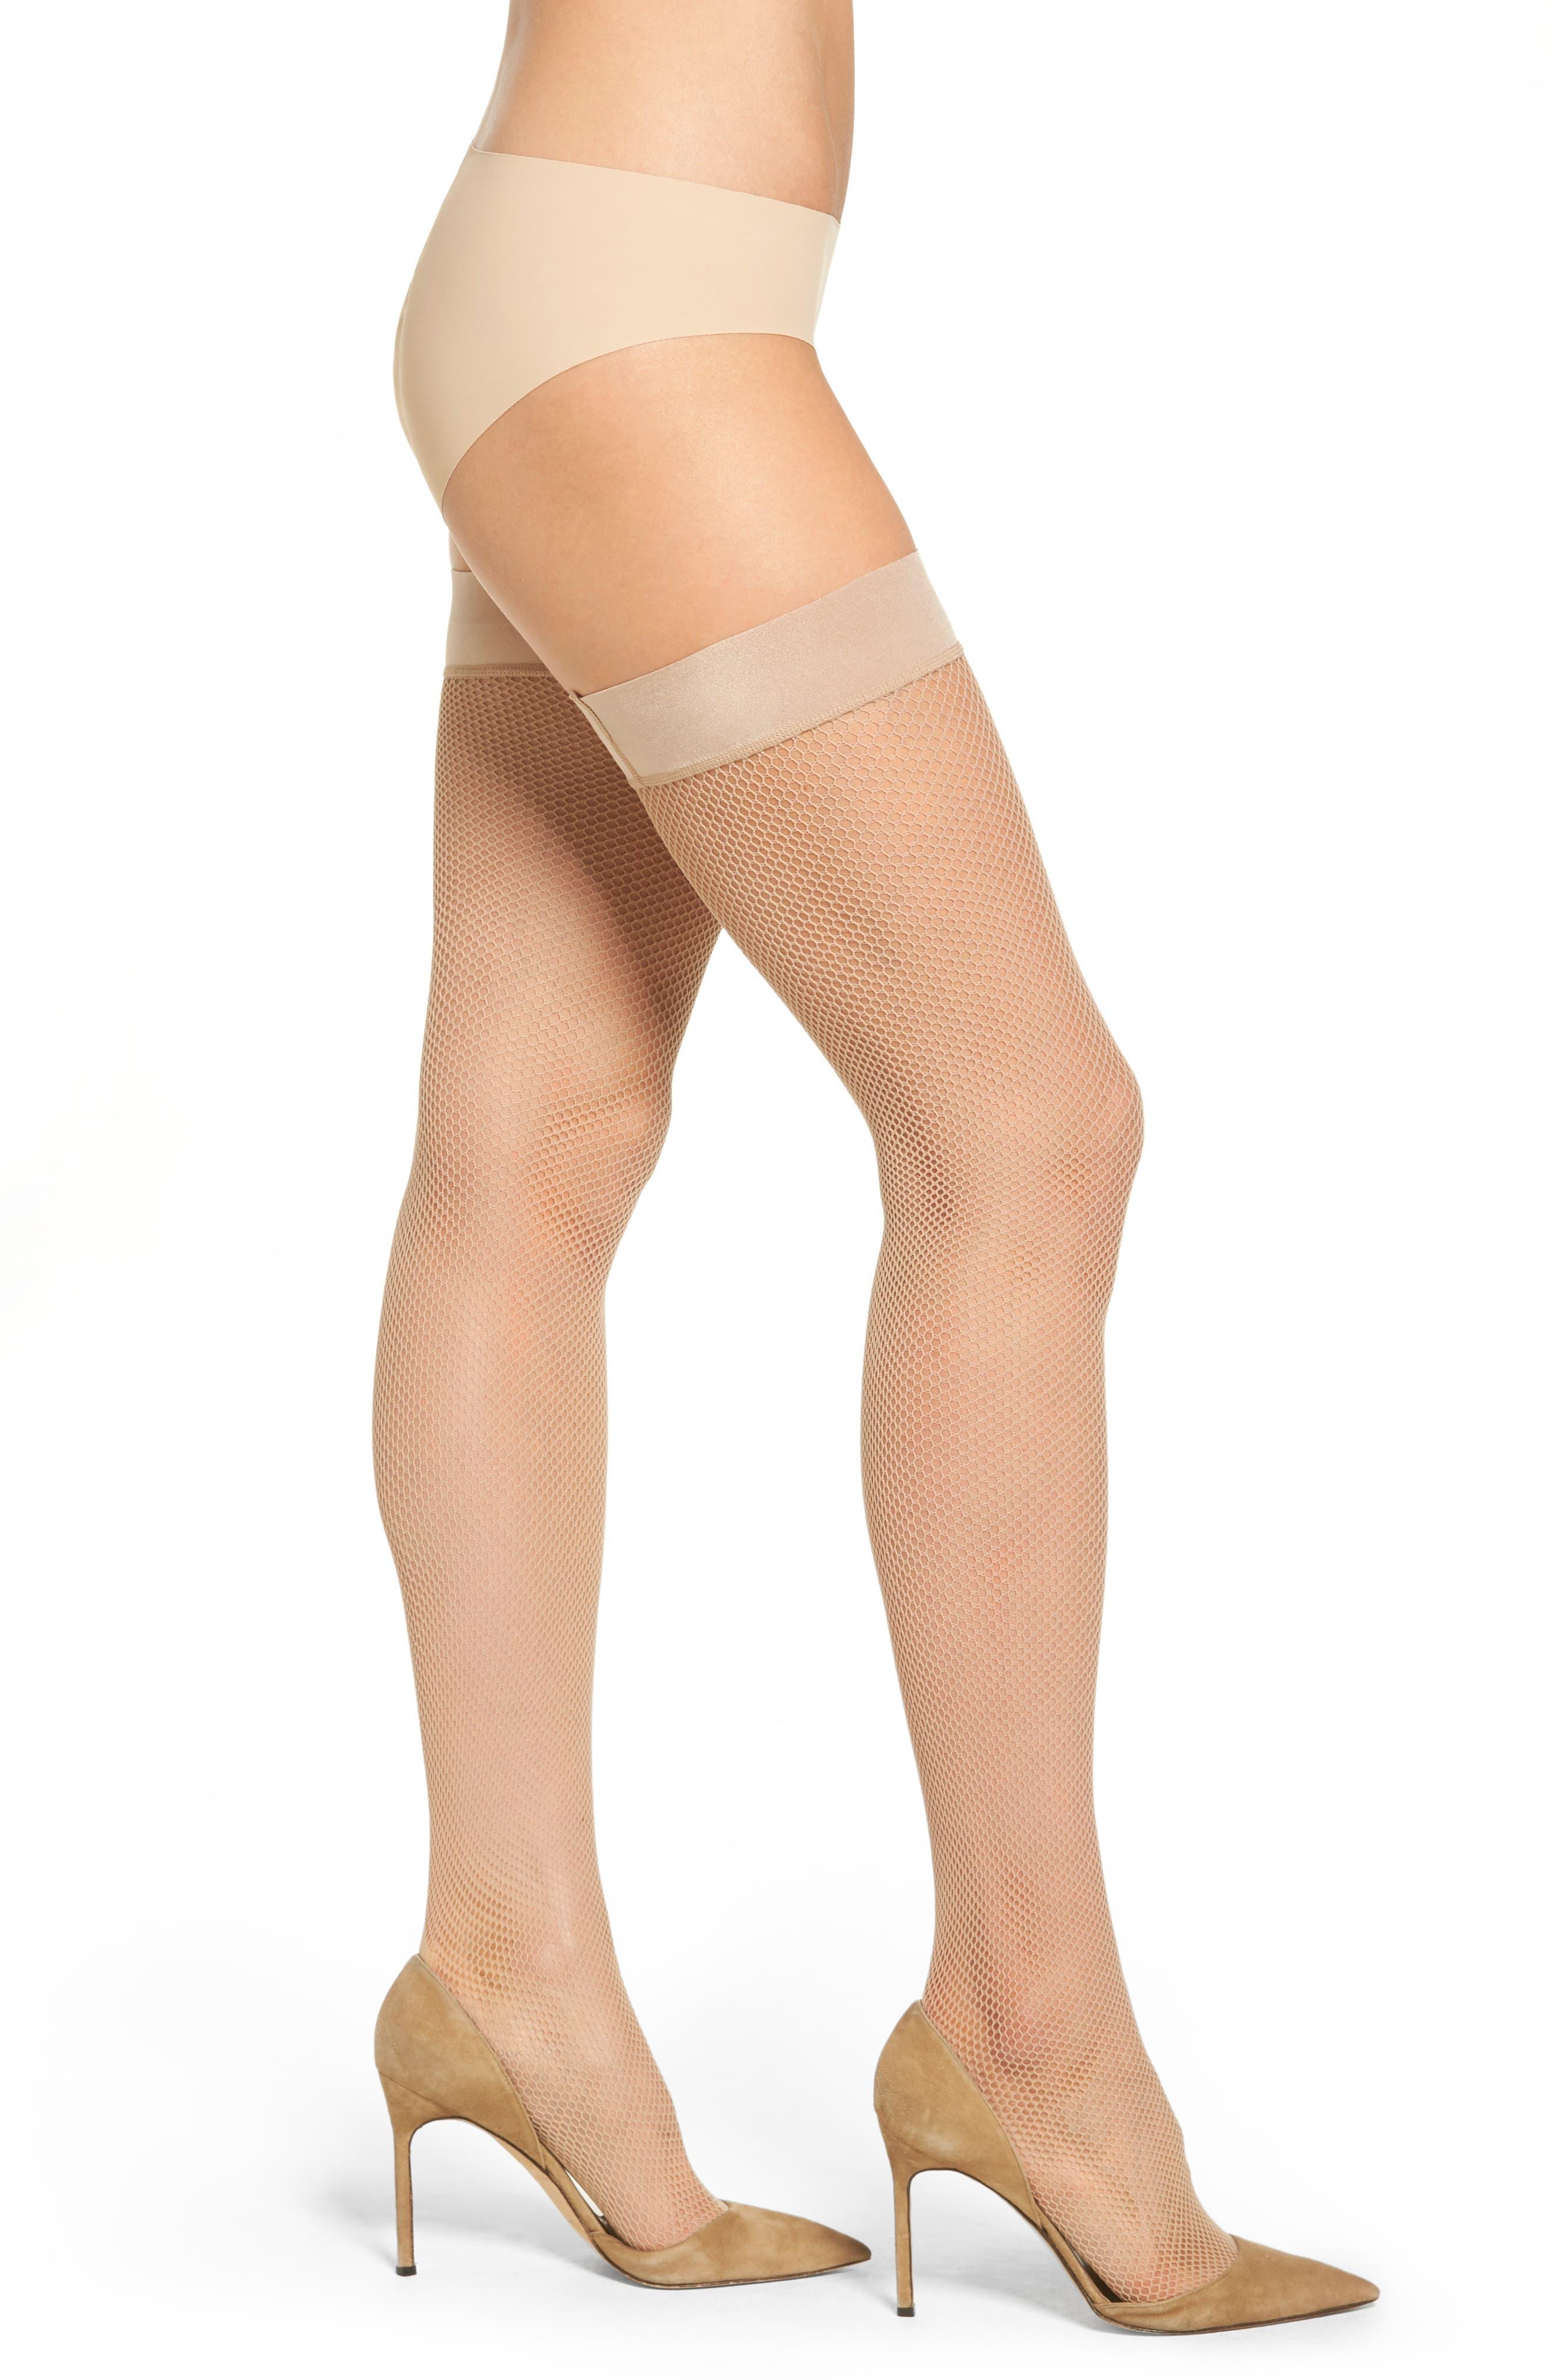 Main Image - DKNY Fishnet Stay-Up Stockings